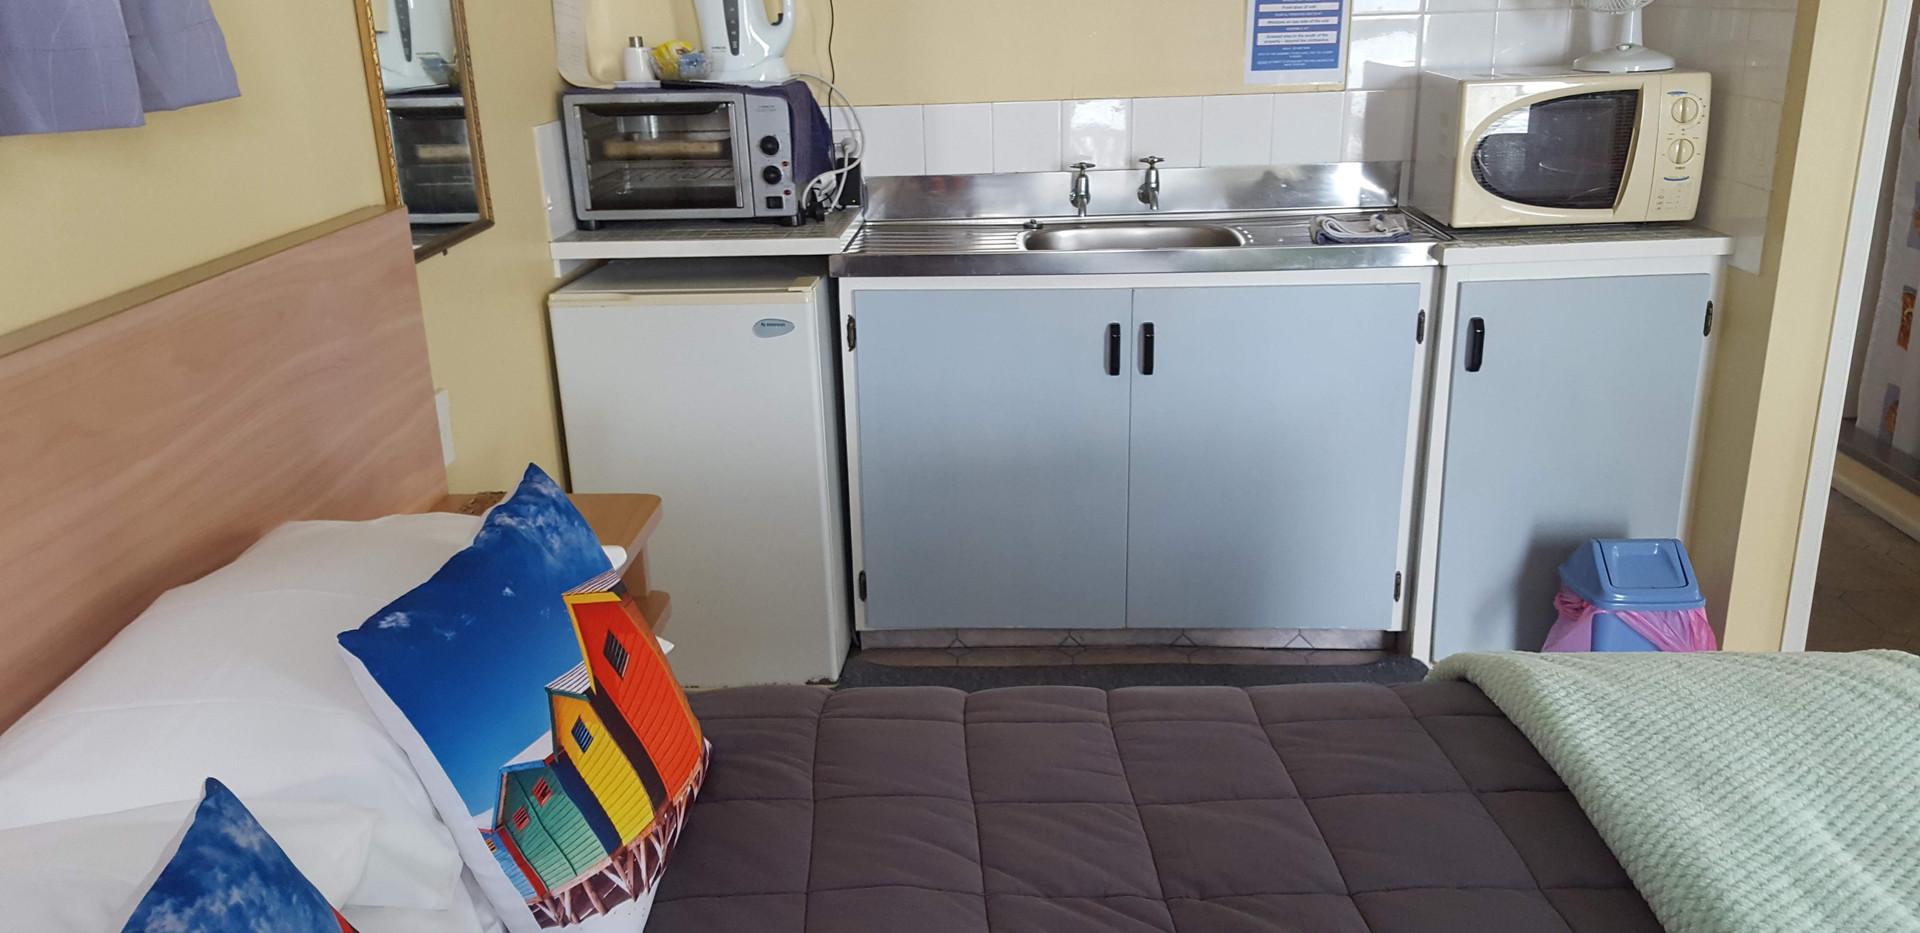 Studio unit at Seaspray Motel with retro kitchen